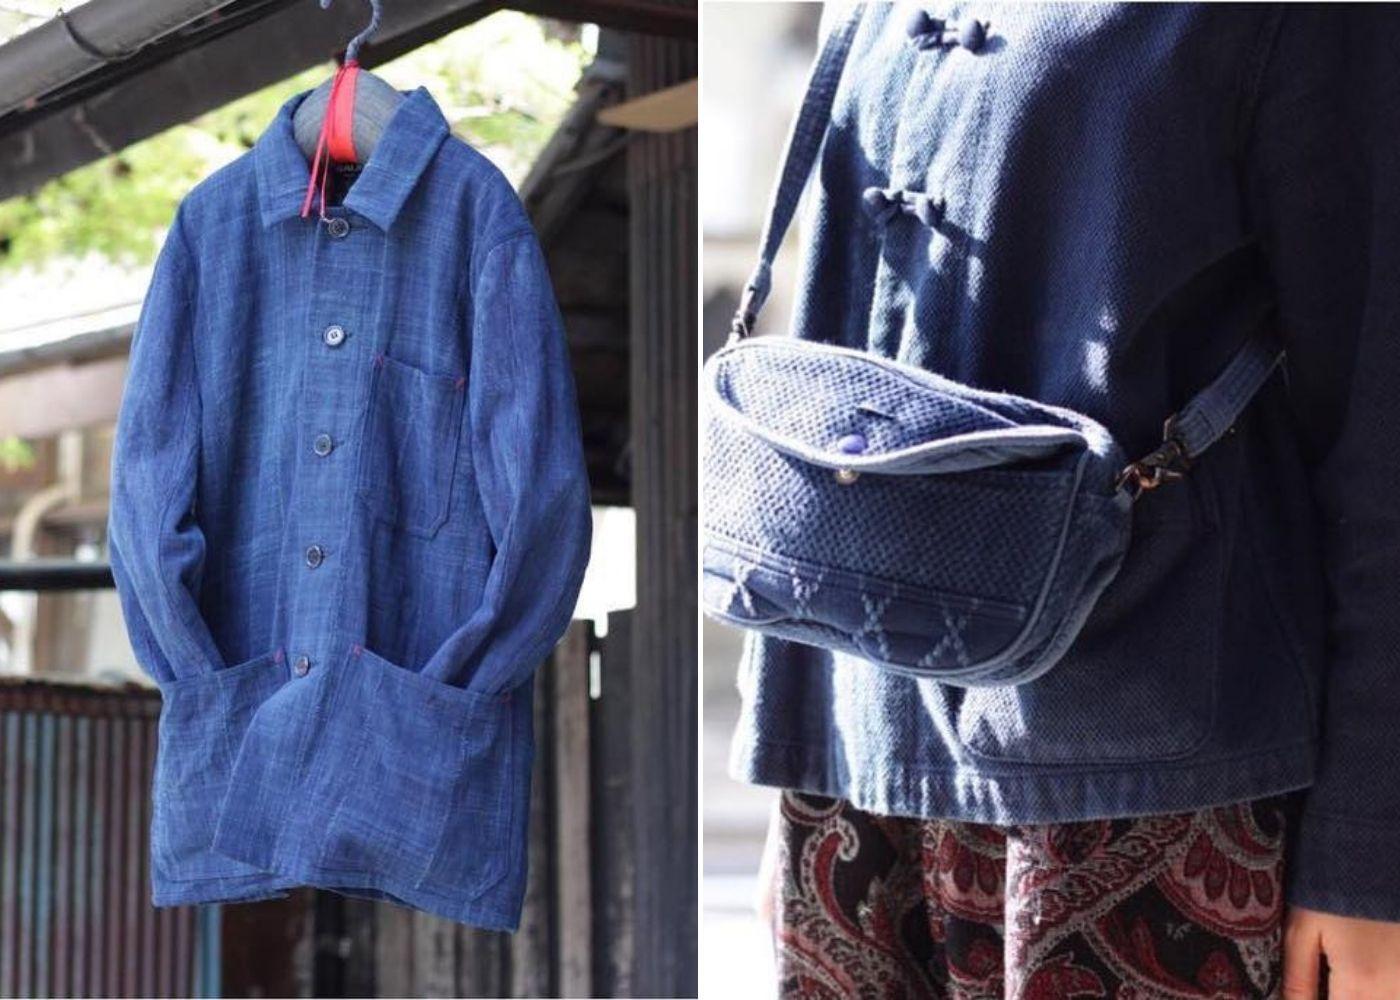 Where to go shopping in Ebisu Tokyo: indigo dyed clothing at Okura